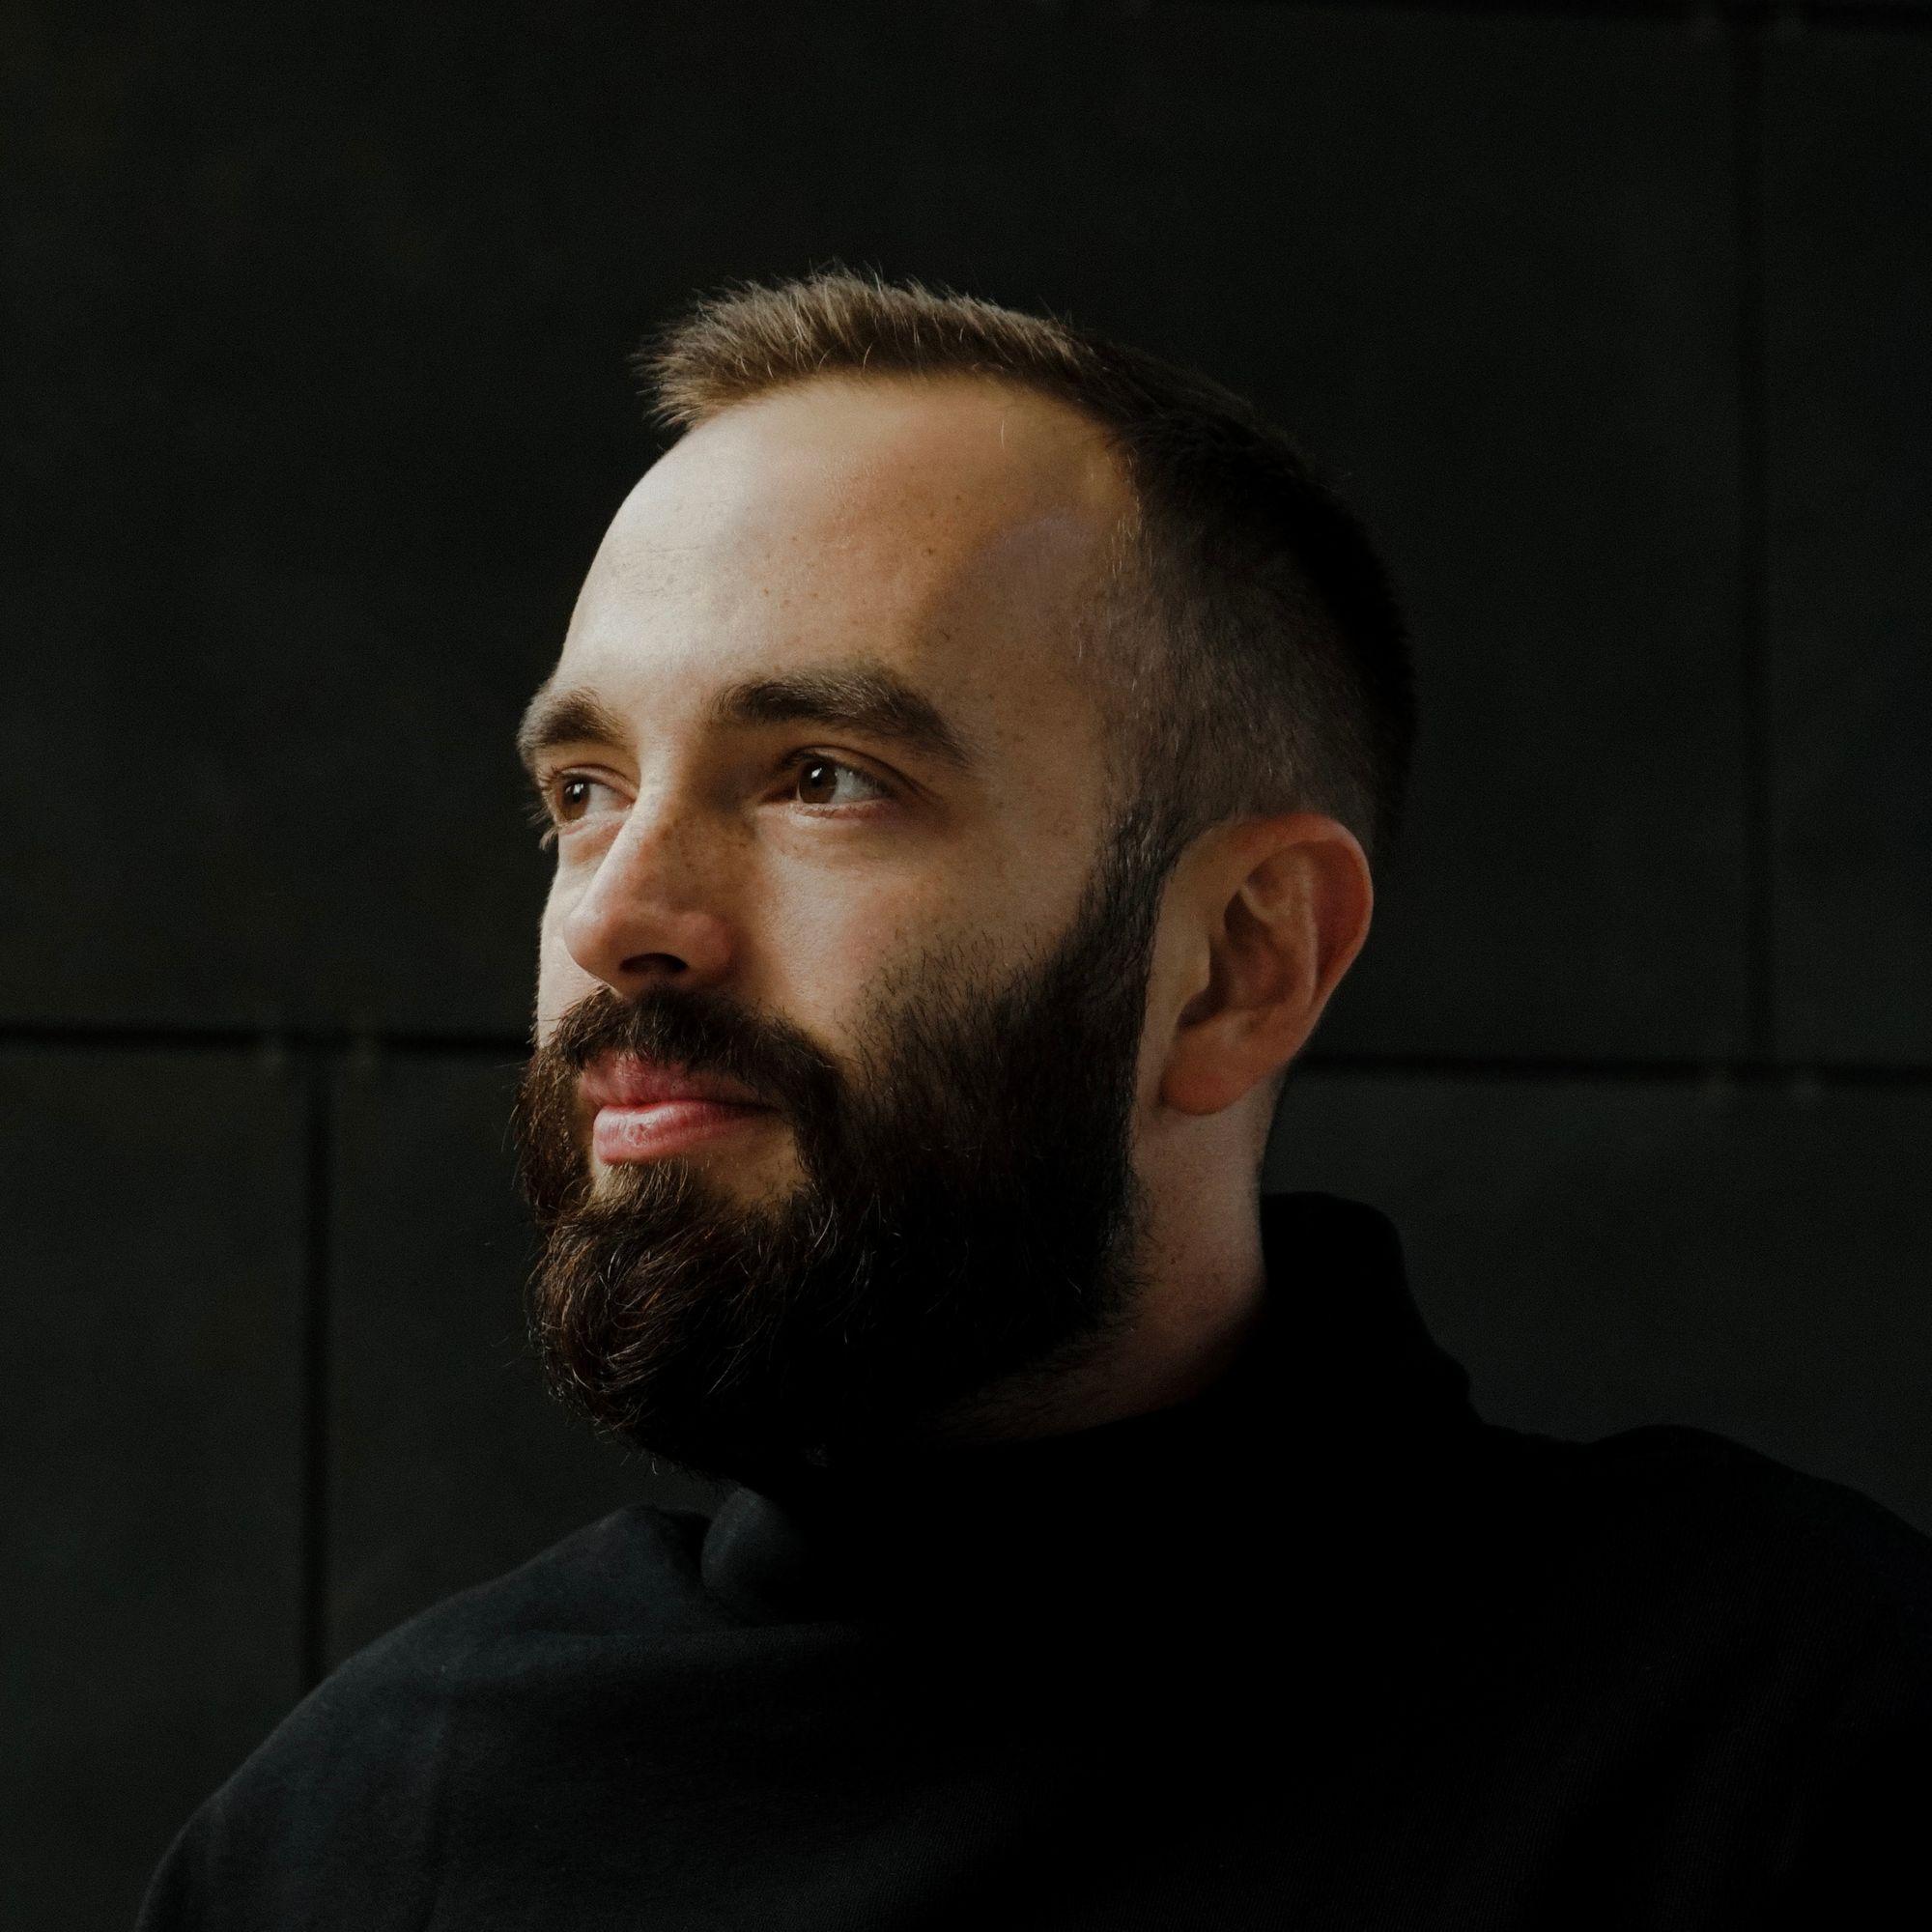 Ivan Altsybieiev